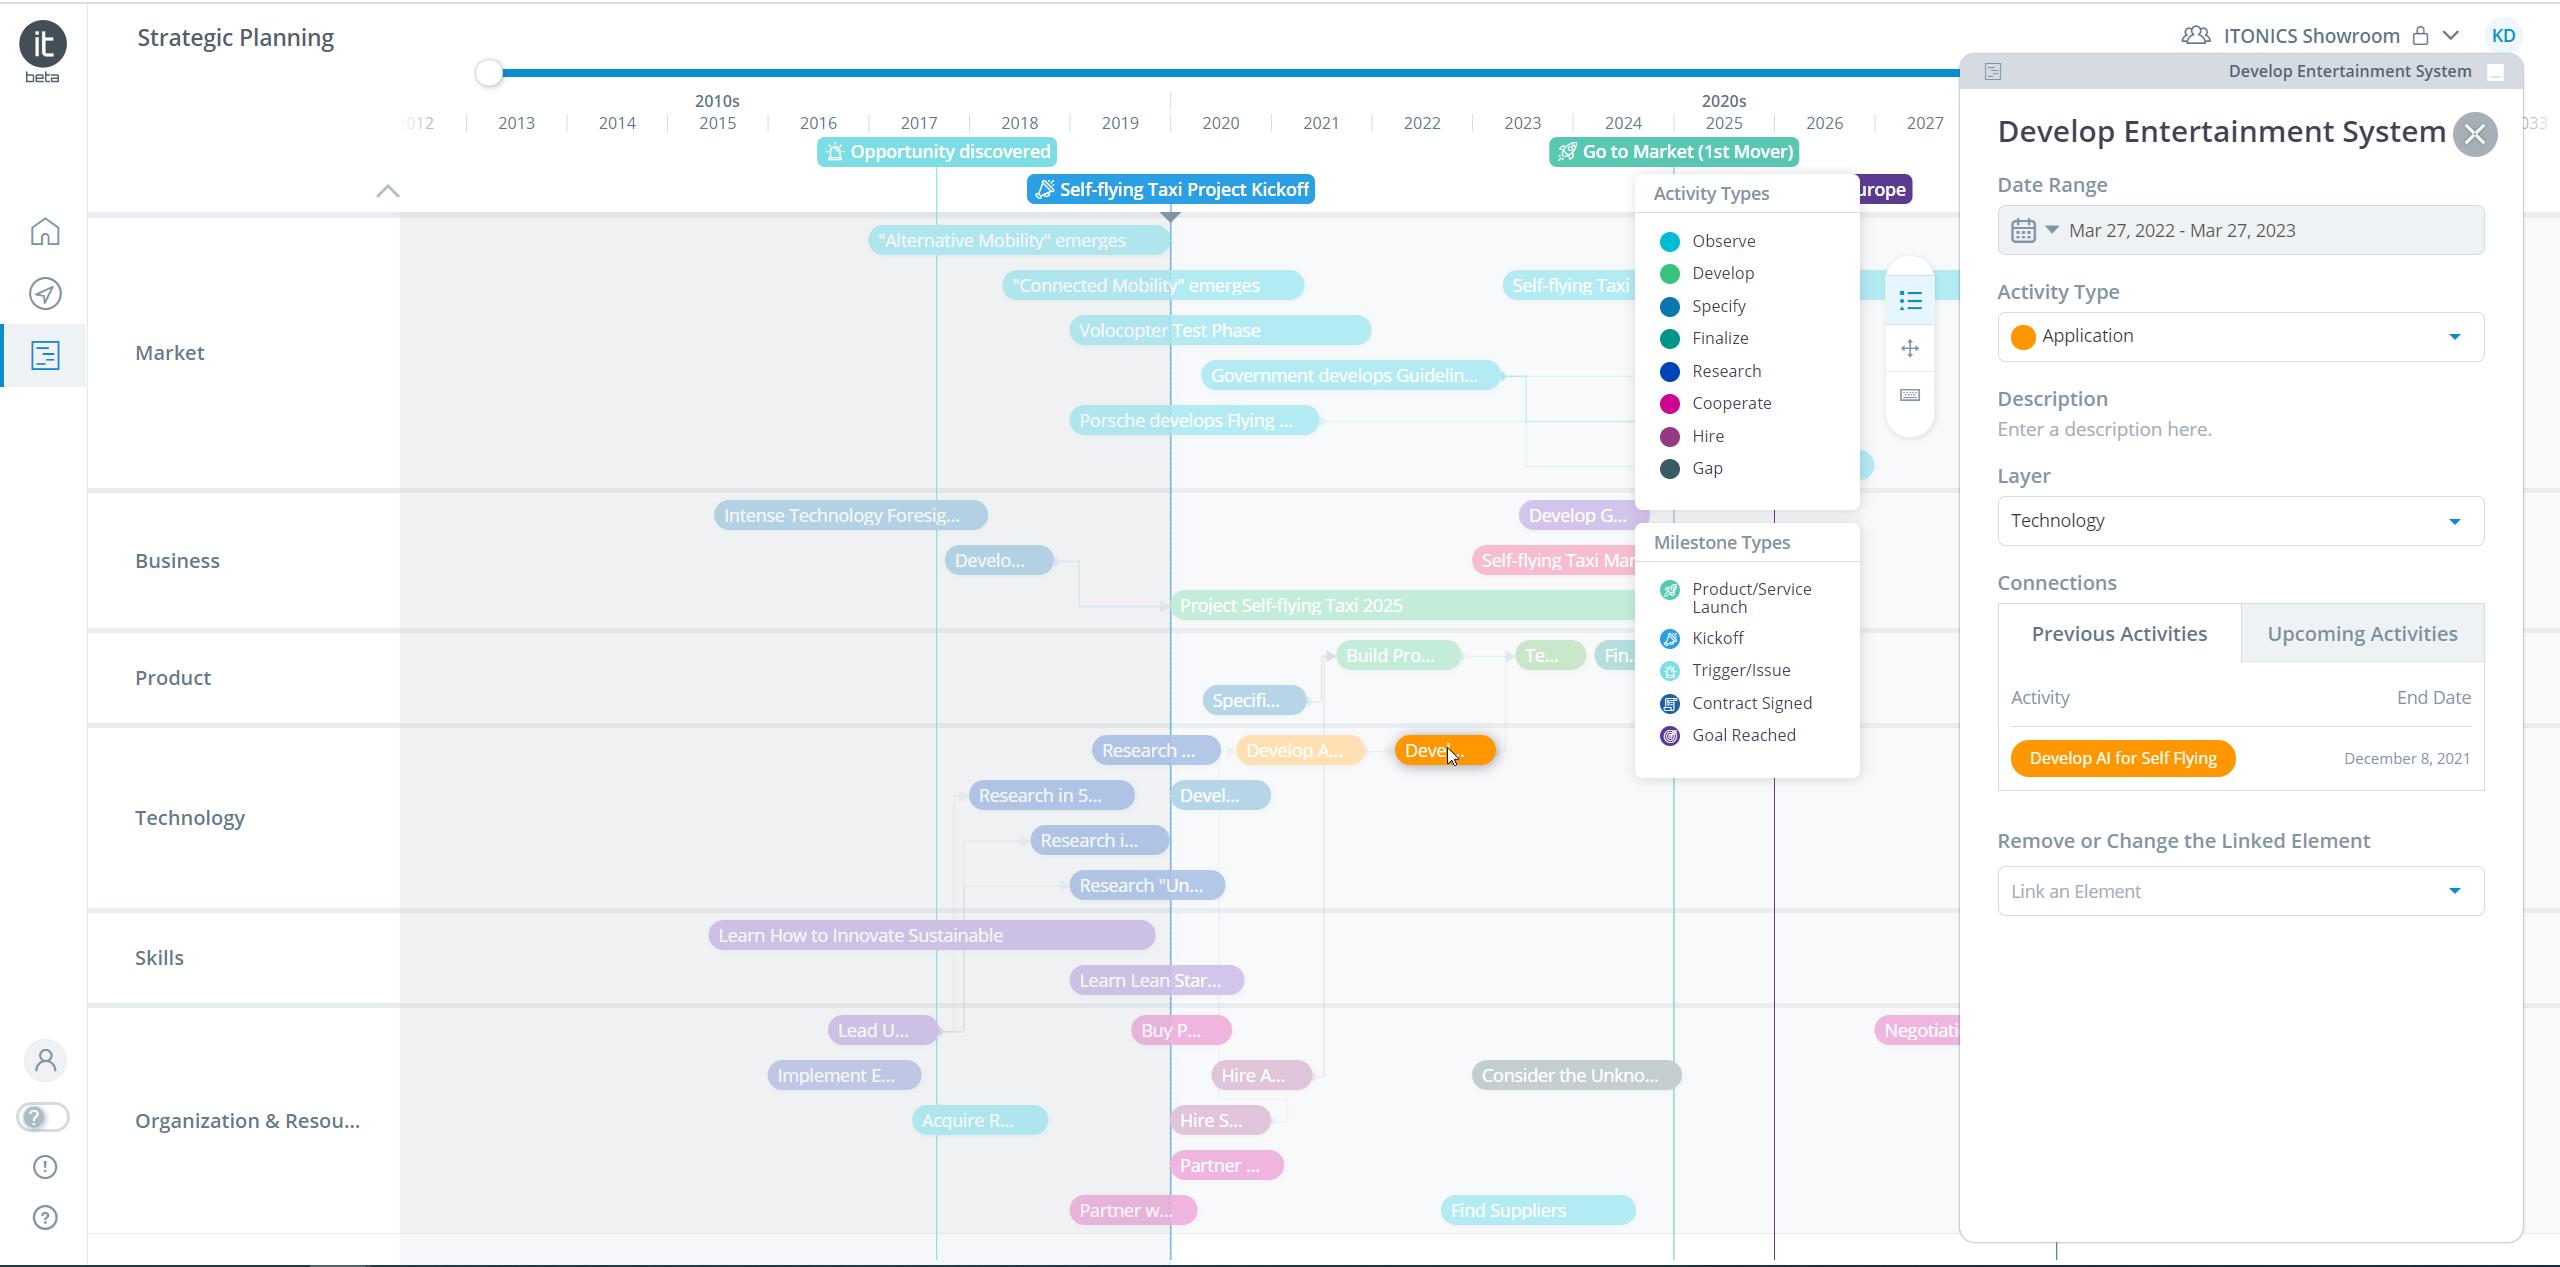 Roadmap Milestones & Data Export